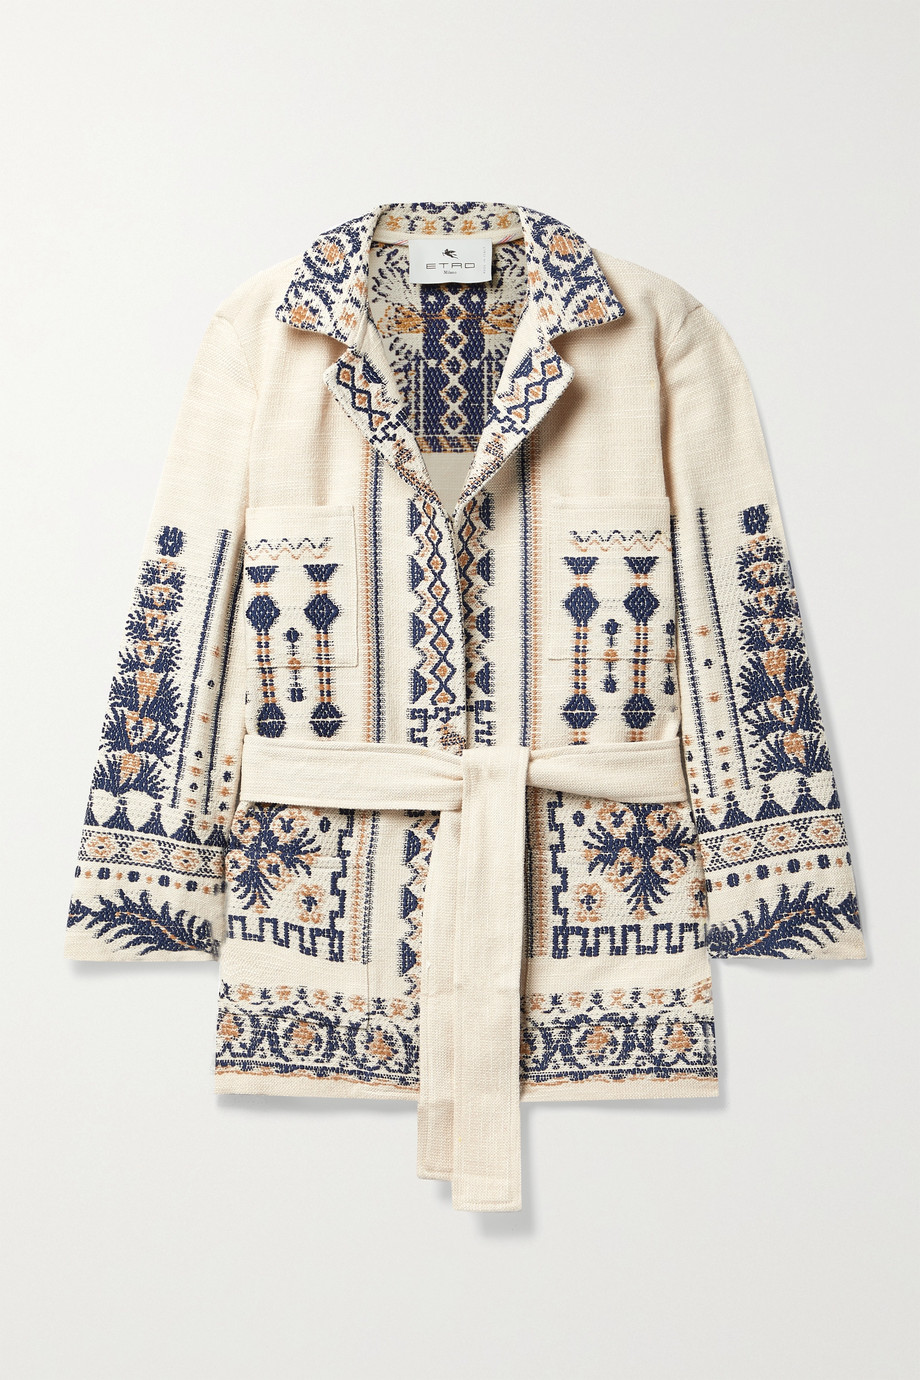 Etro Palmaria belted wool-blend jacquard jacket